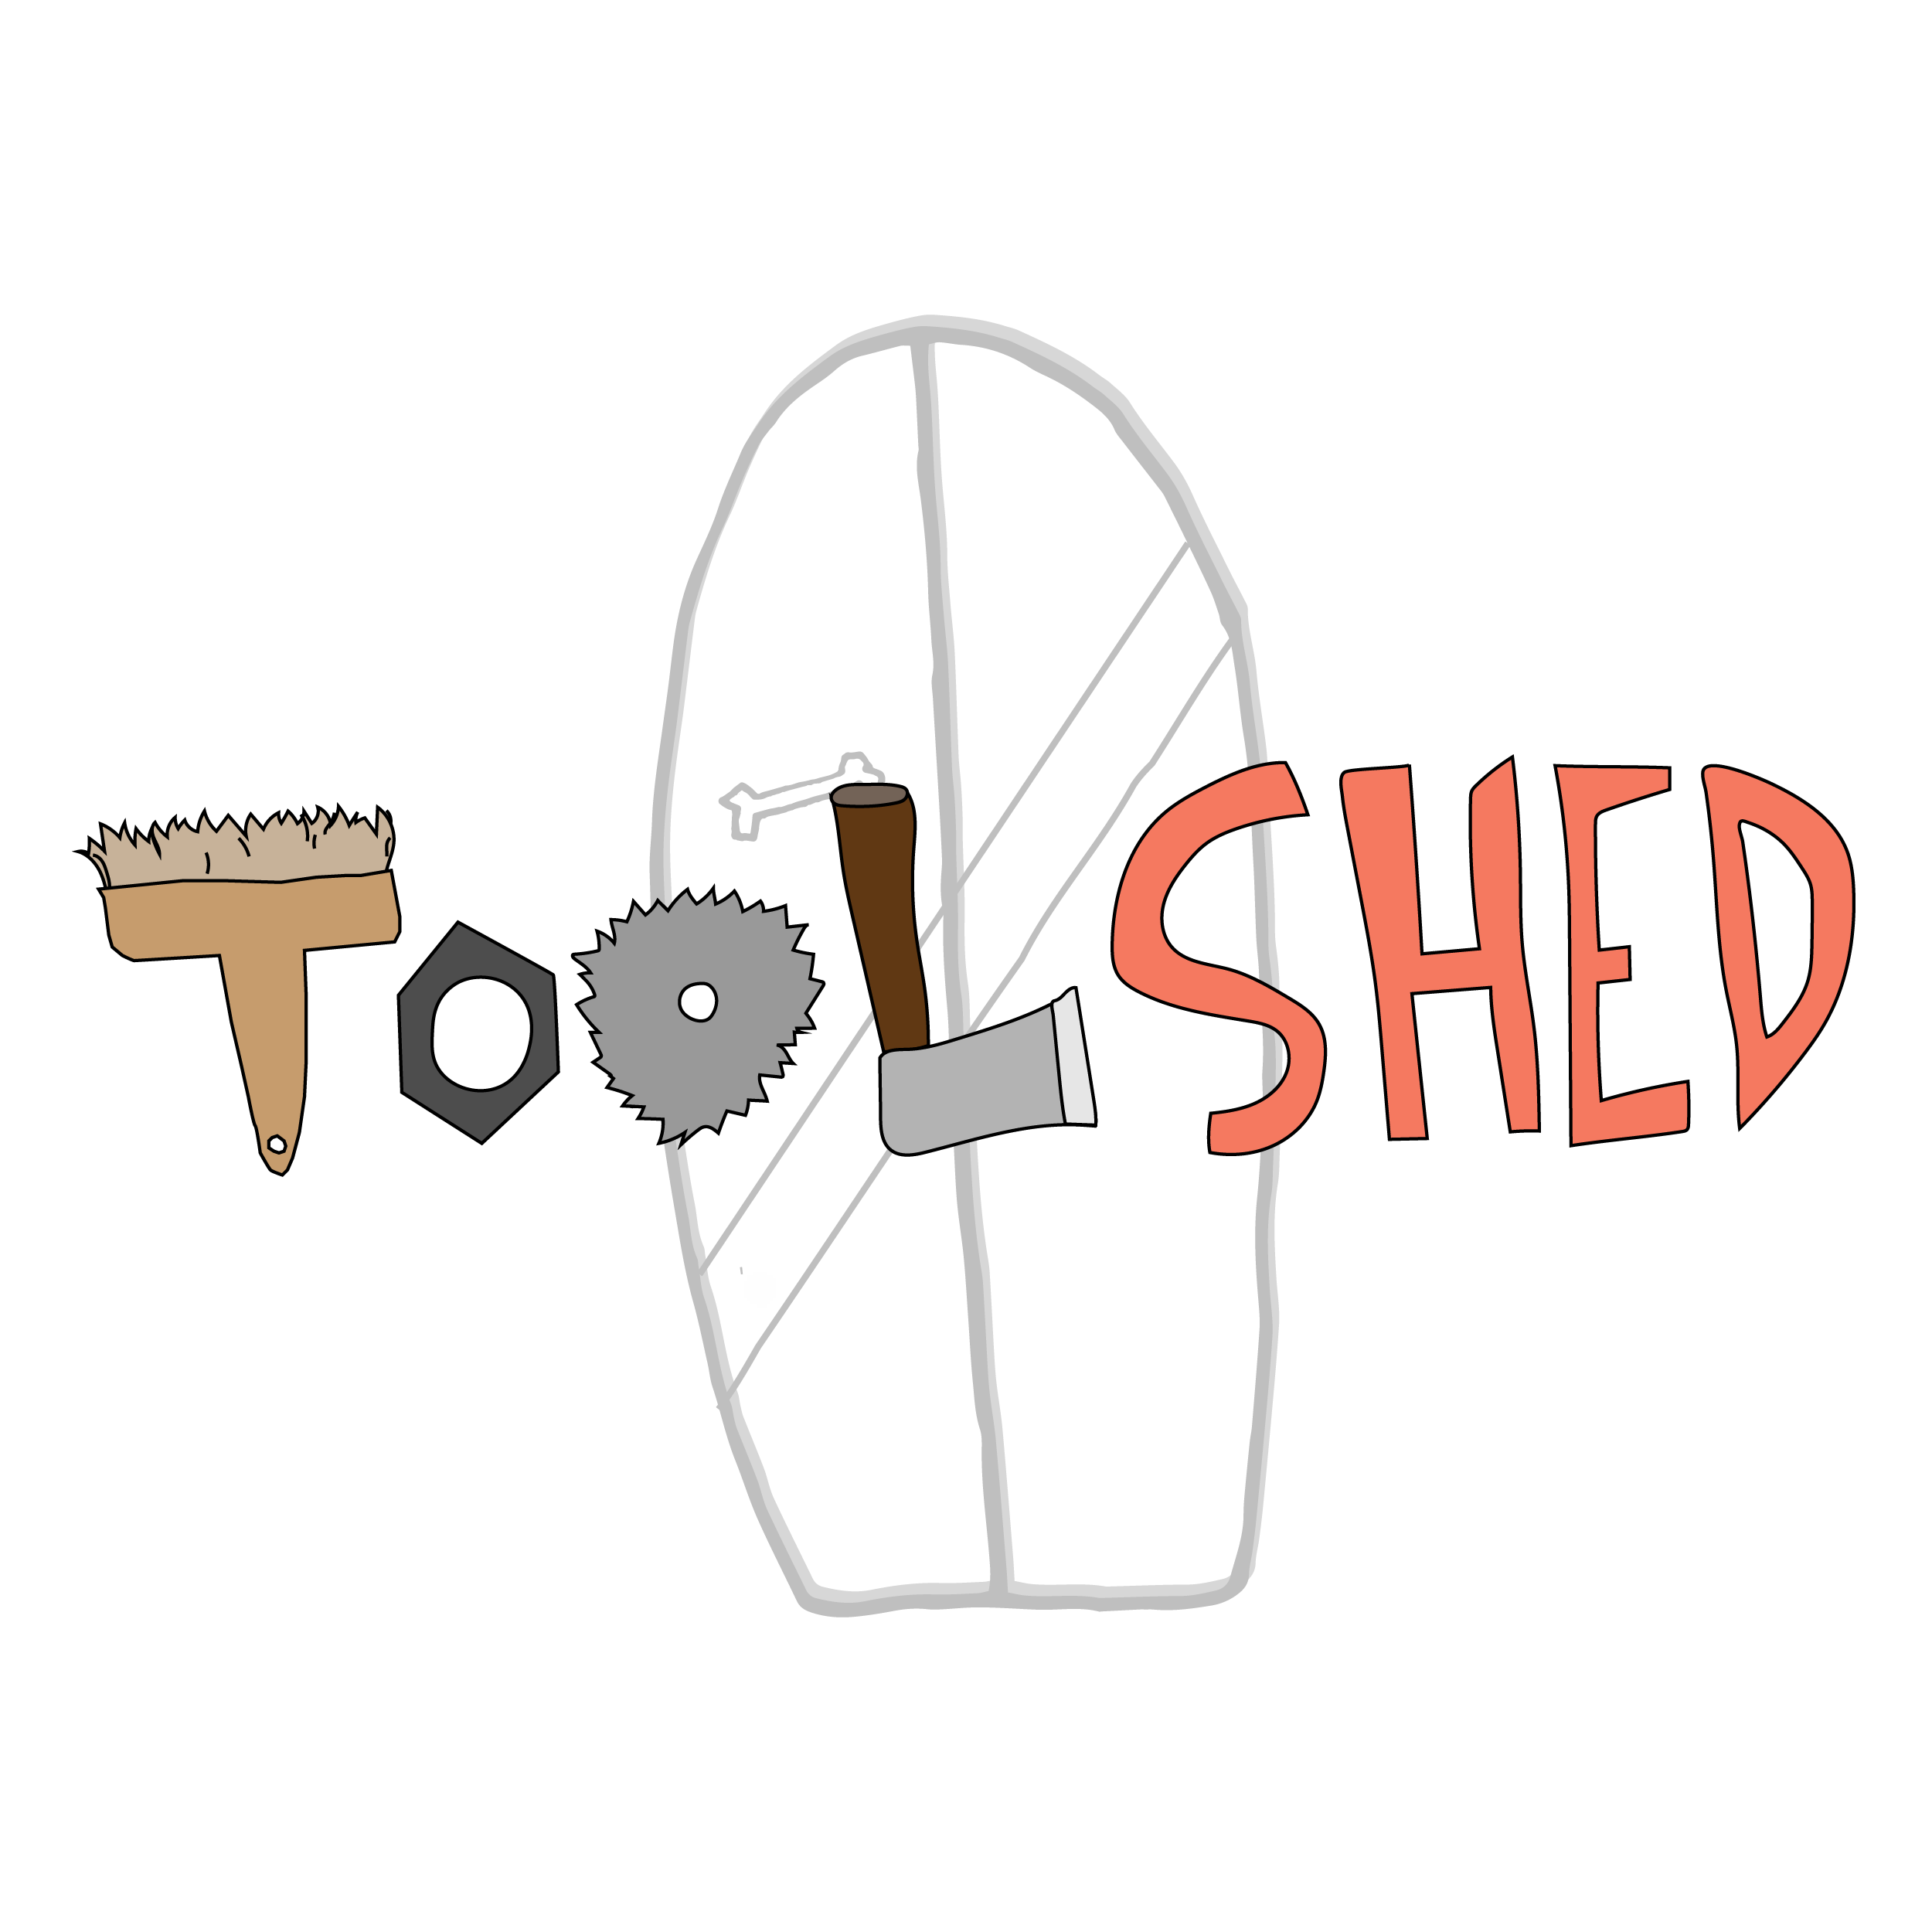 ToolShedWeb-01.png